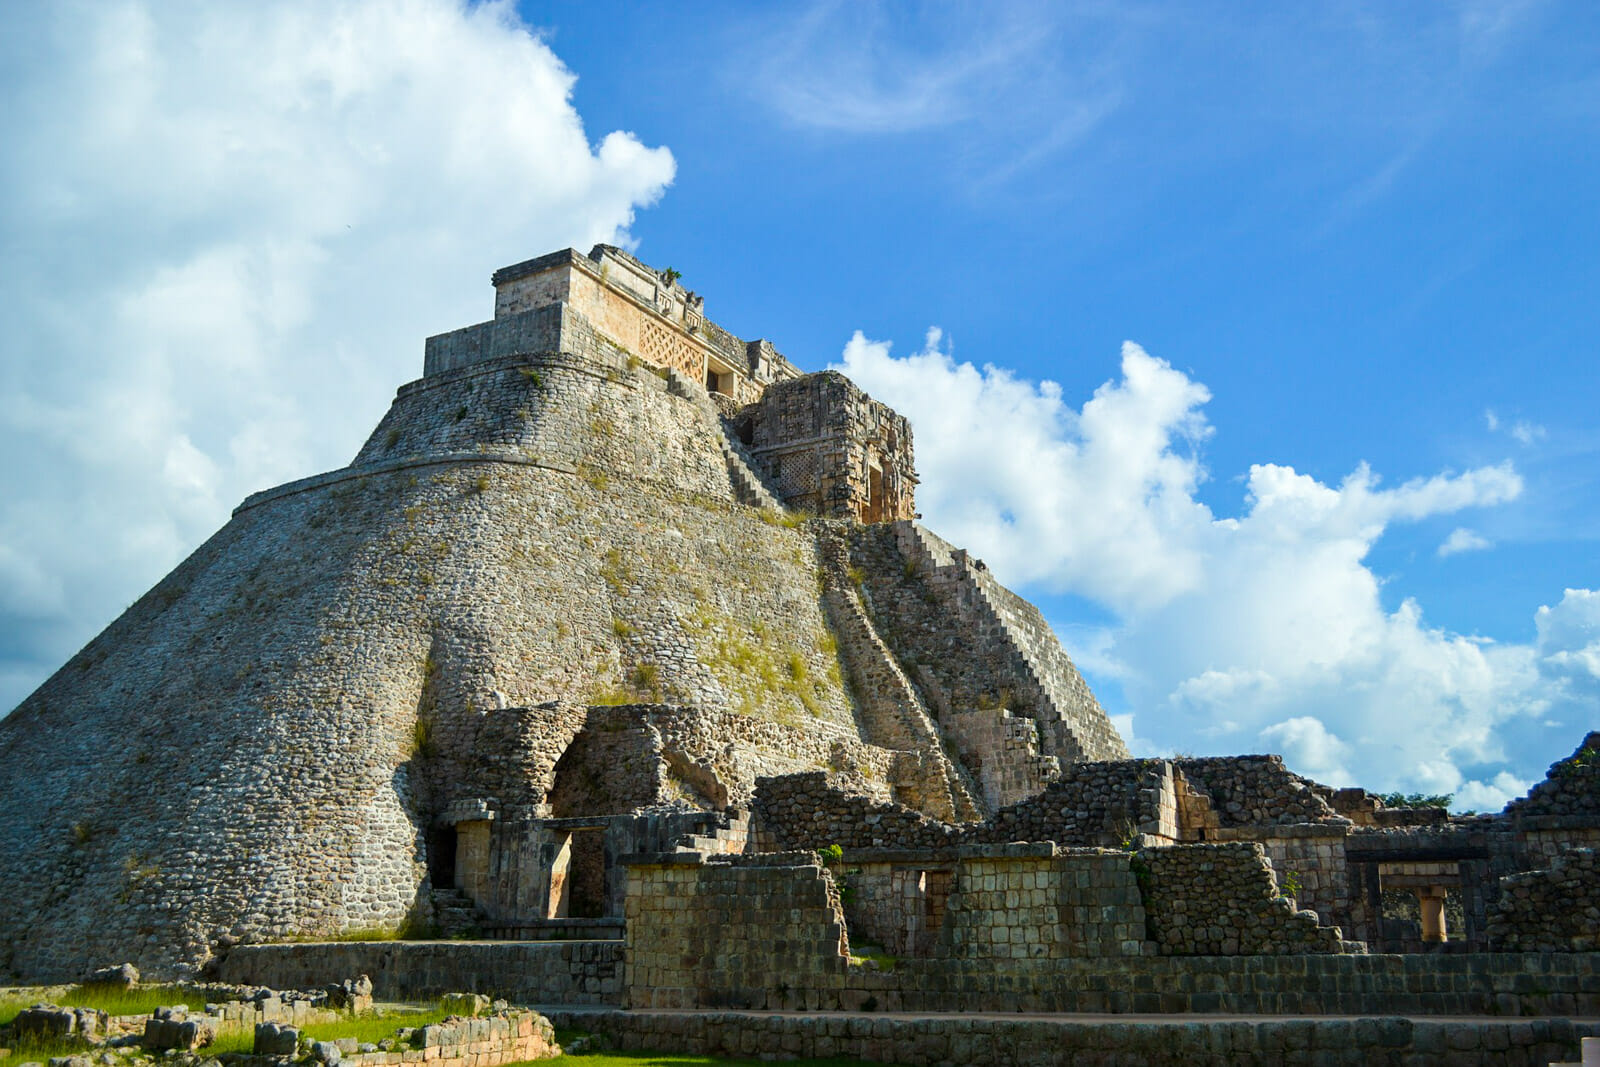 The Uxmal Pyramid of Wonders